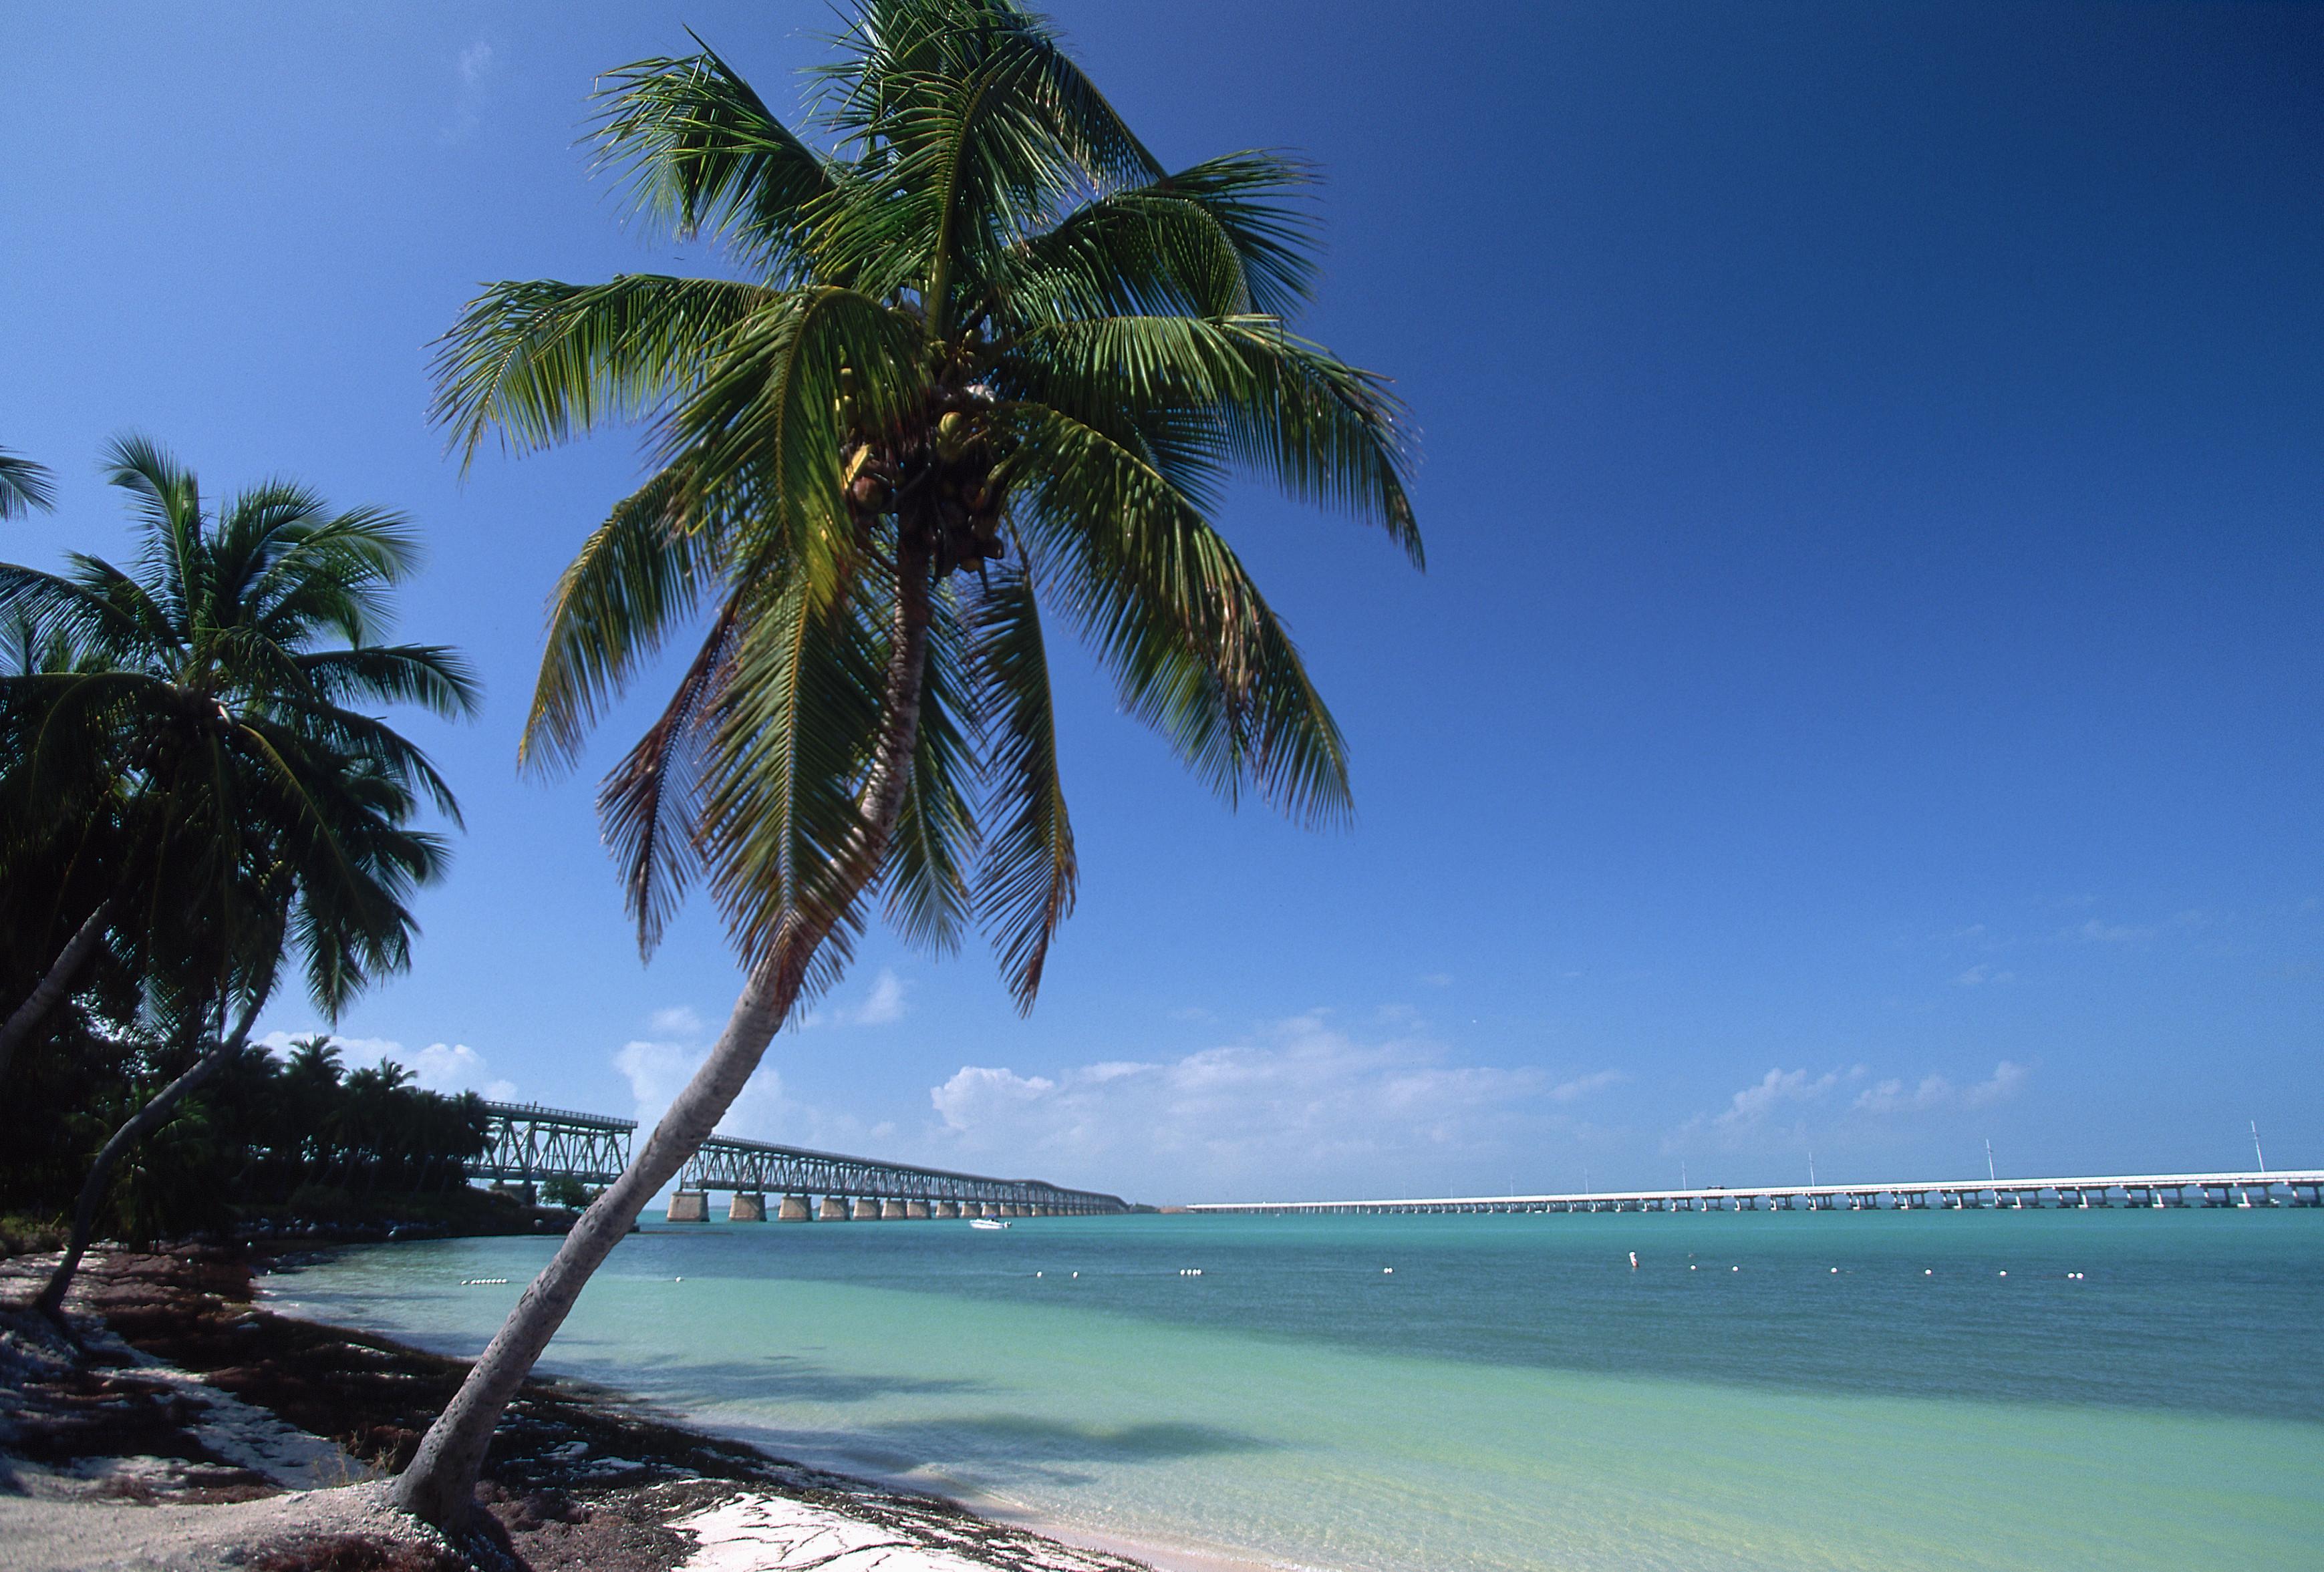 Florida Pictures - Florida - HISTORY.com